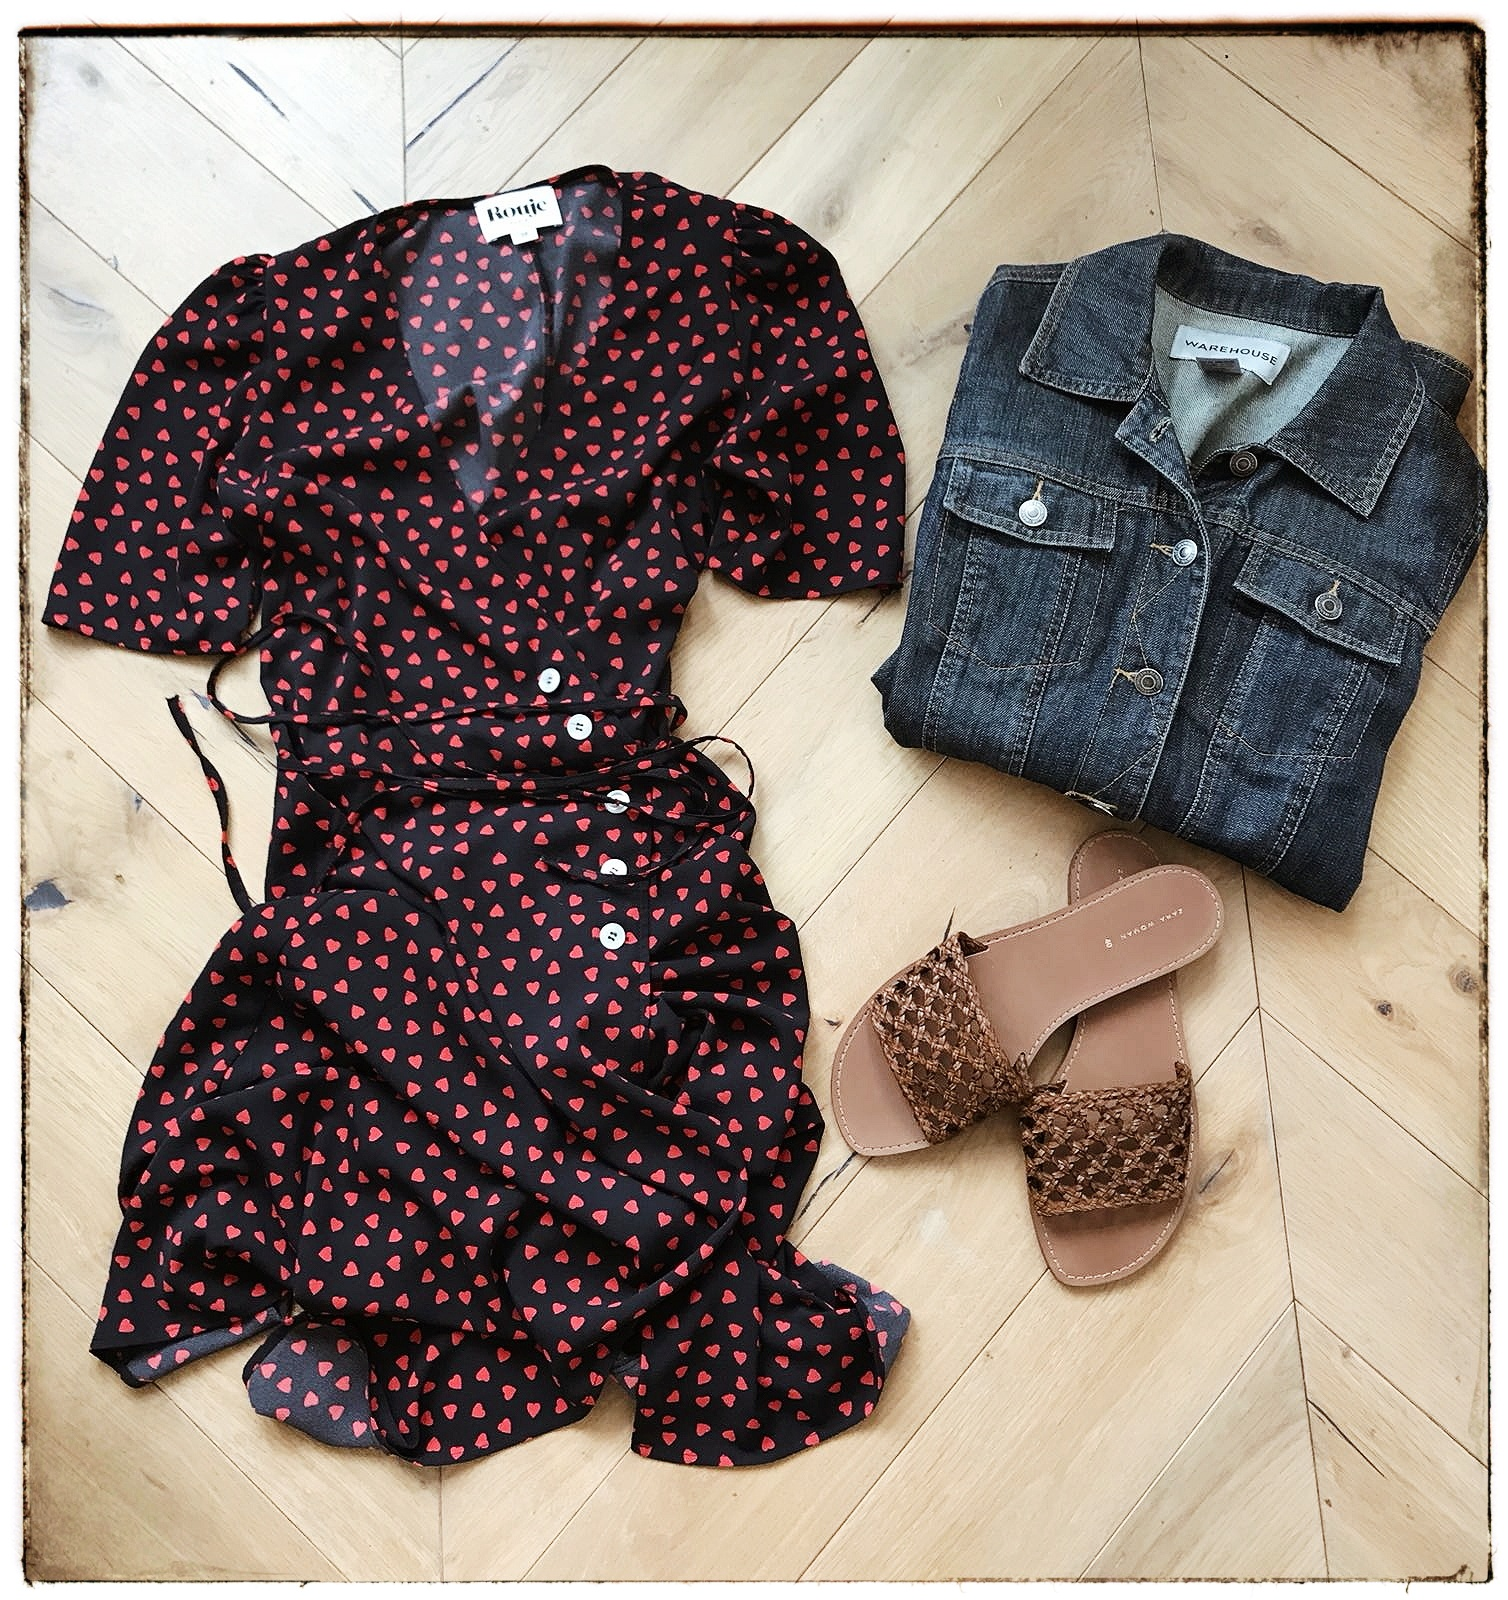 Rouje  dress,  Zara  Sandals,  Warehouse  denim jacket (old)